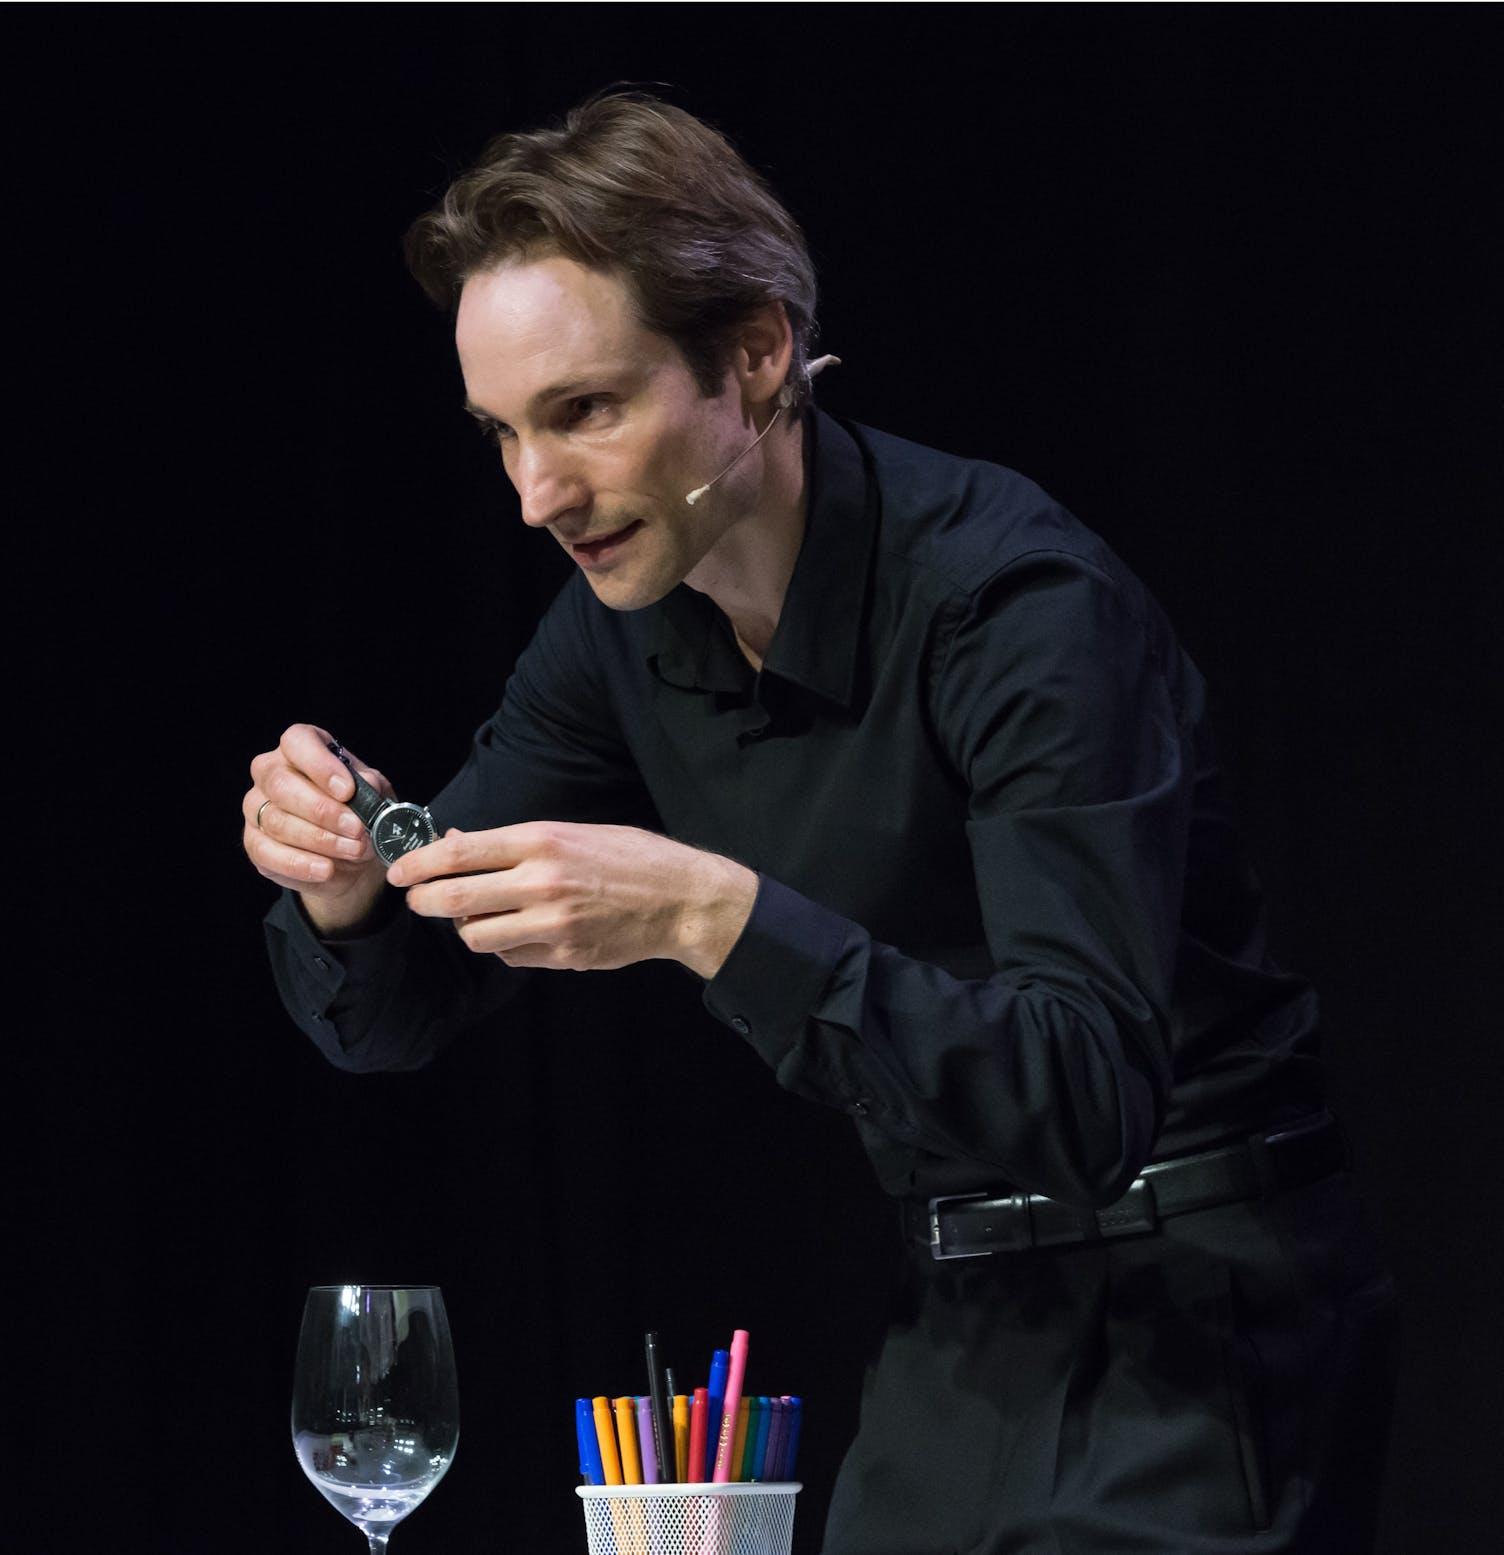 Klaus Gremminger